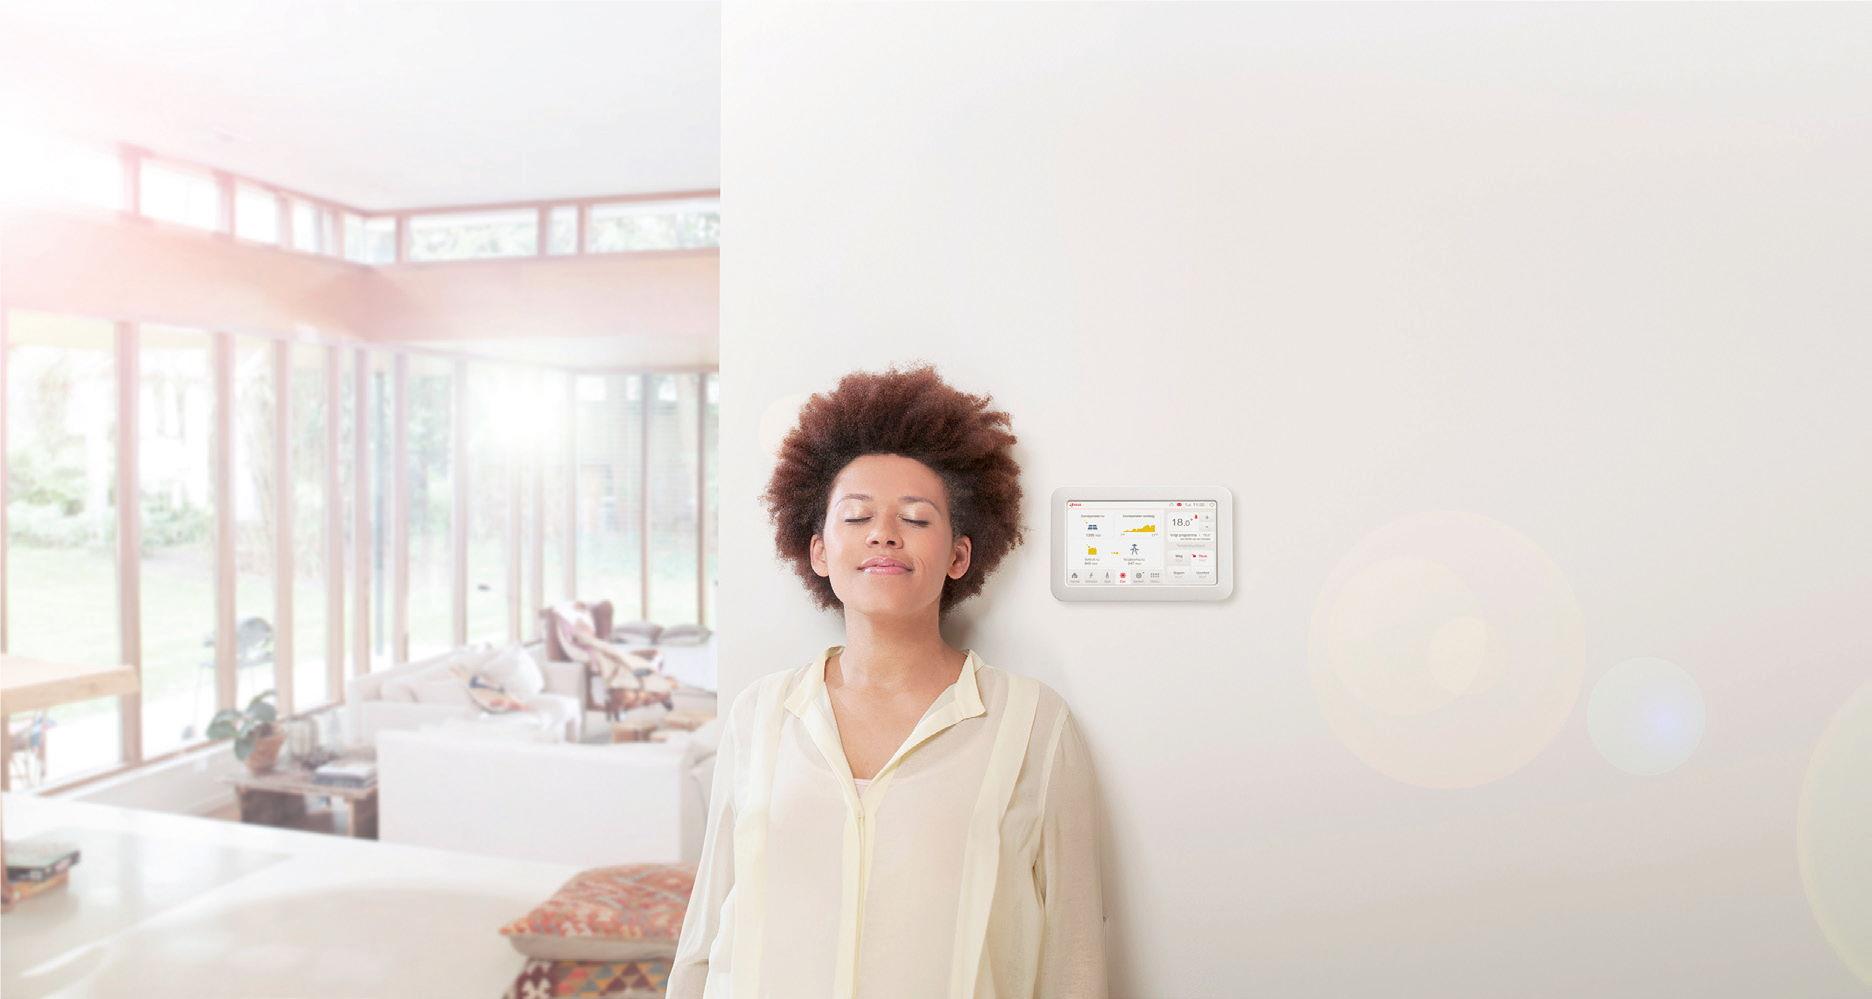 Lees meer over het artikel Energiezuinige woning verleidt tot hoger energieverbruik?